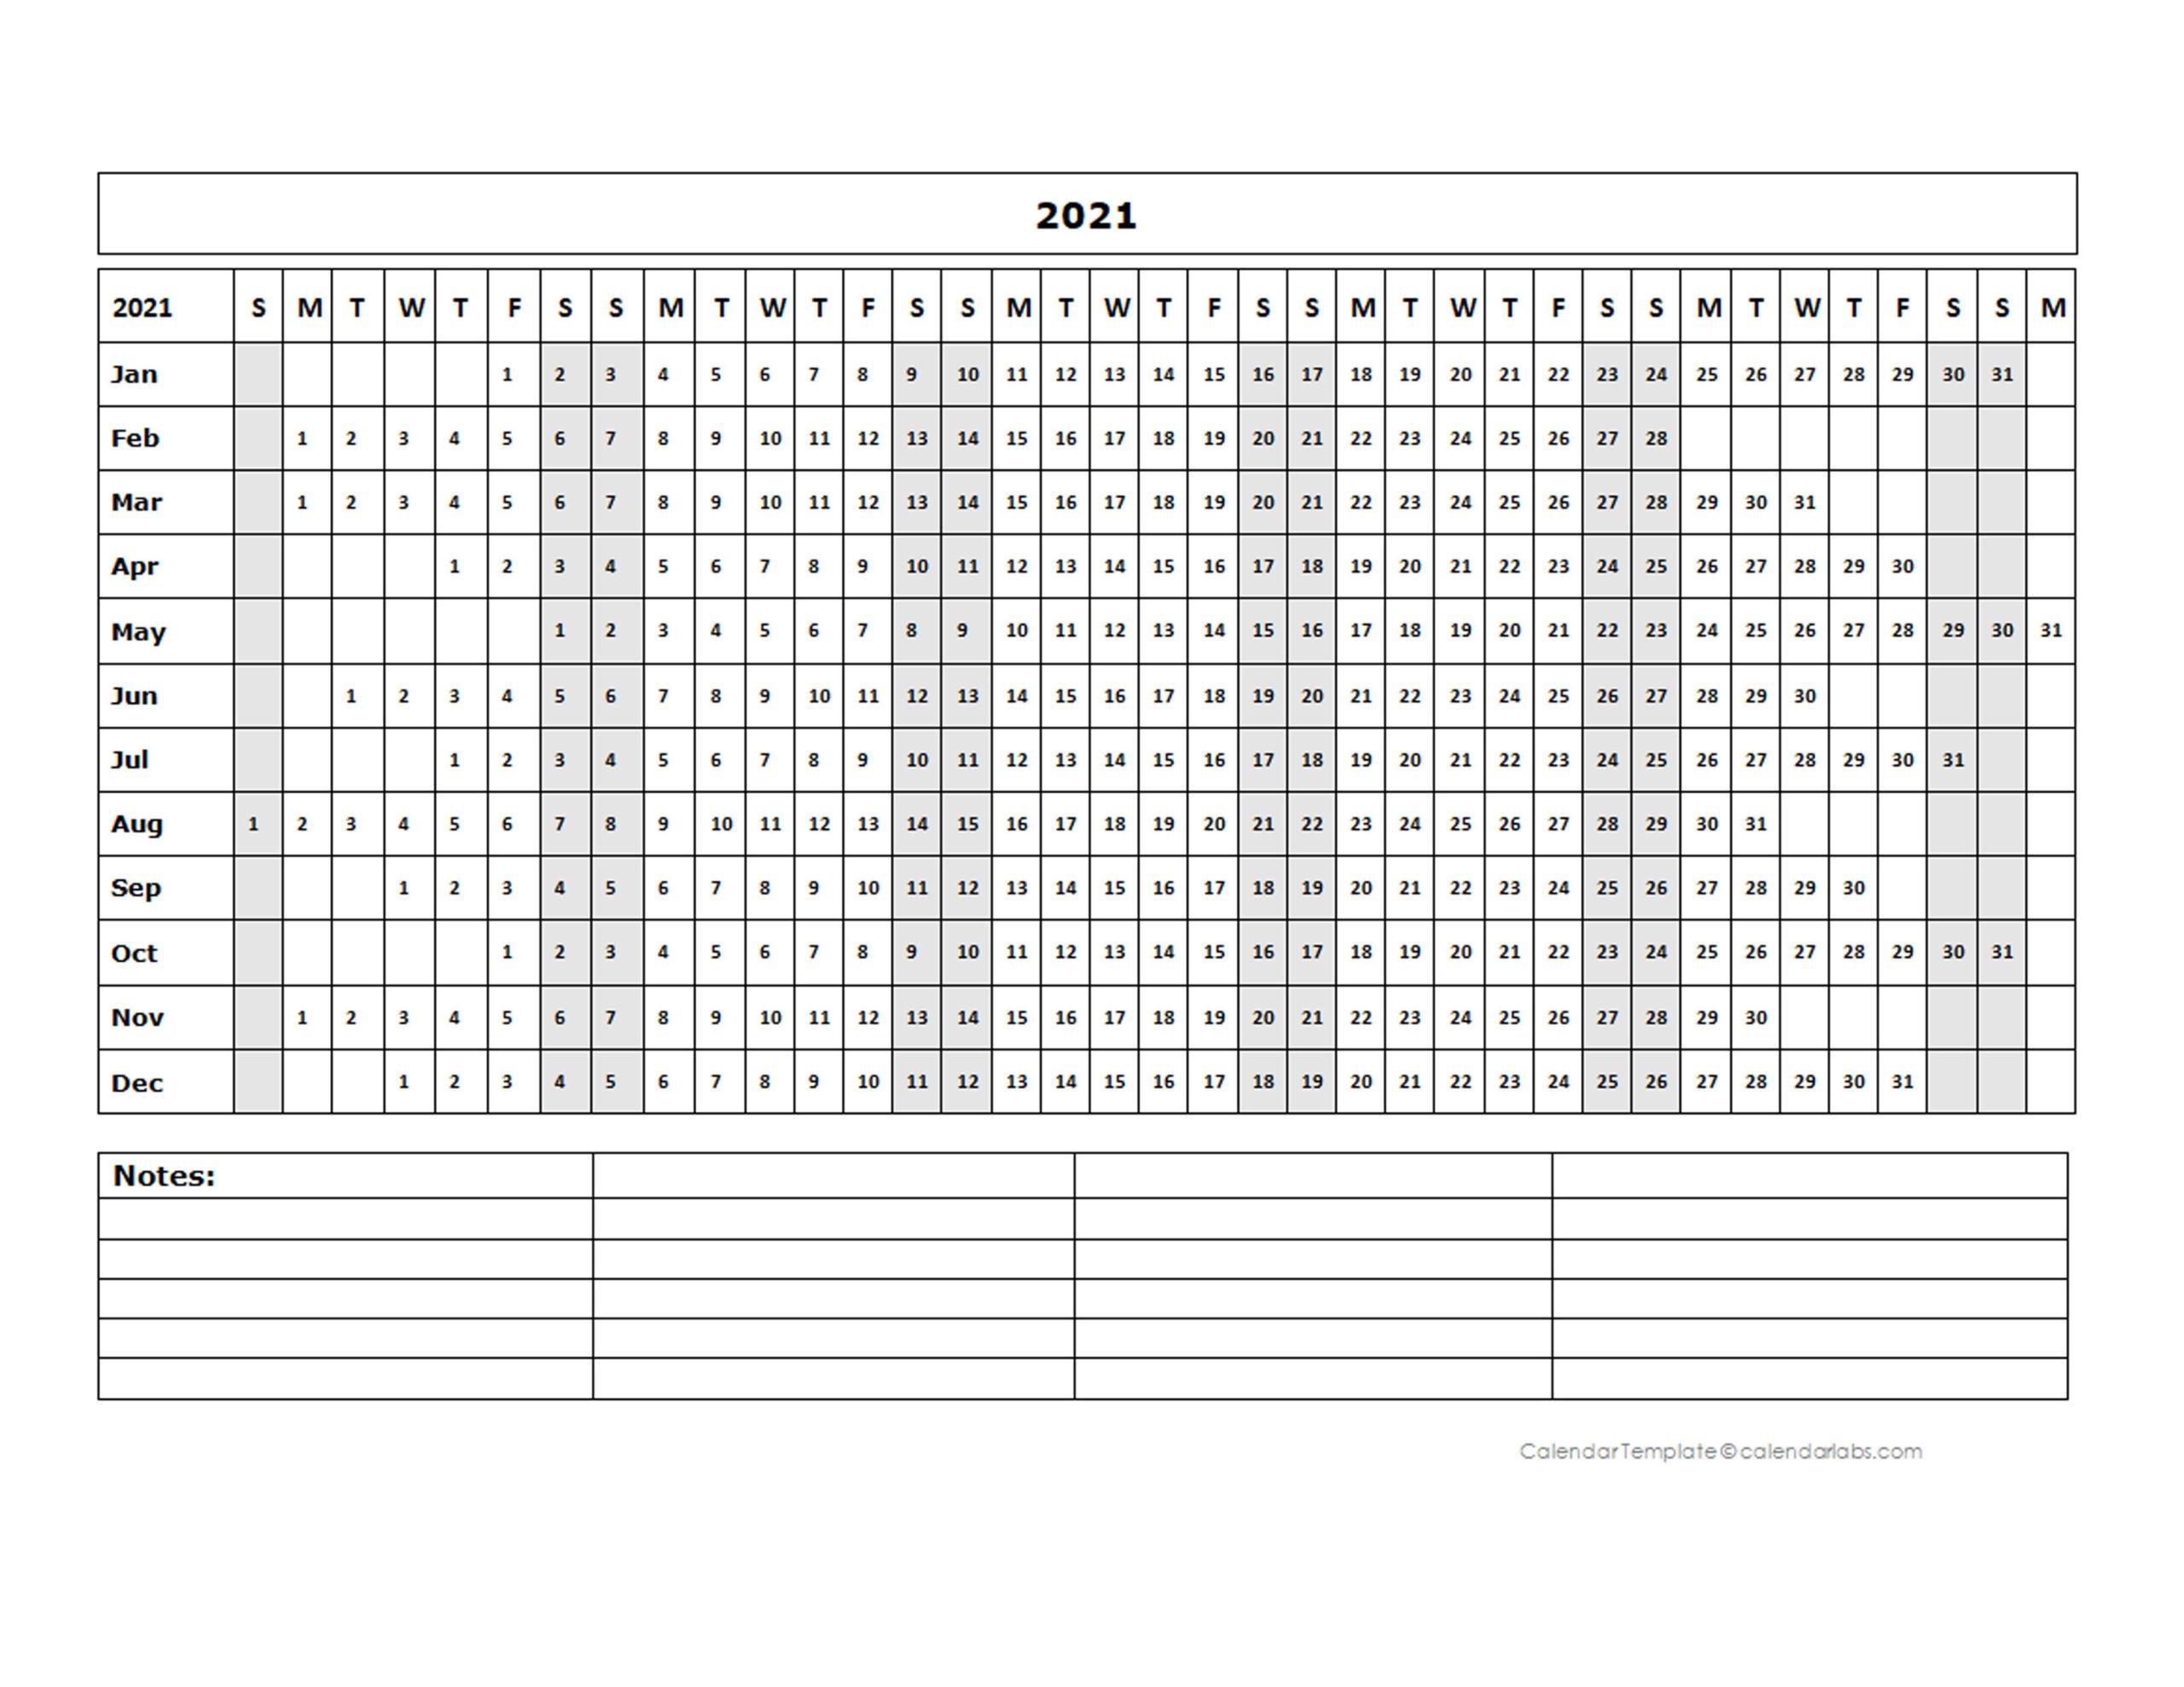 2021 Blank Landscape Yearly Calendar Template - Free  Julian Calendar 2021 Excel